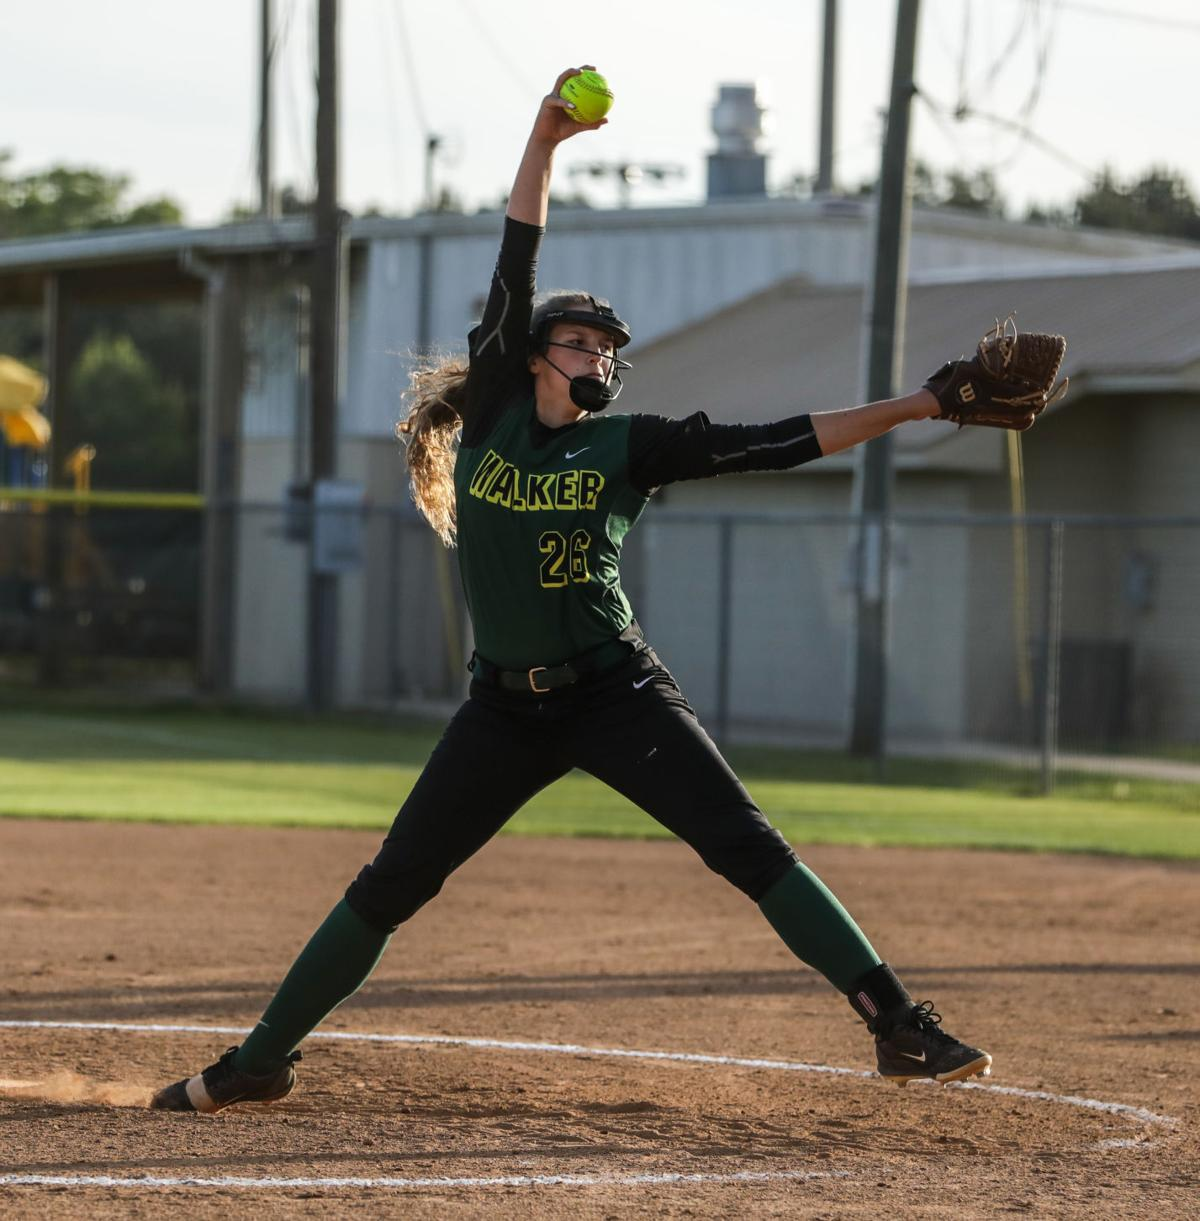 Walker at Live Oak softball Lainee Bailey